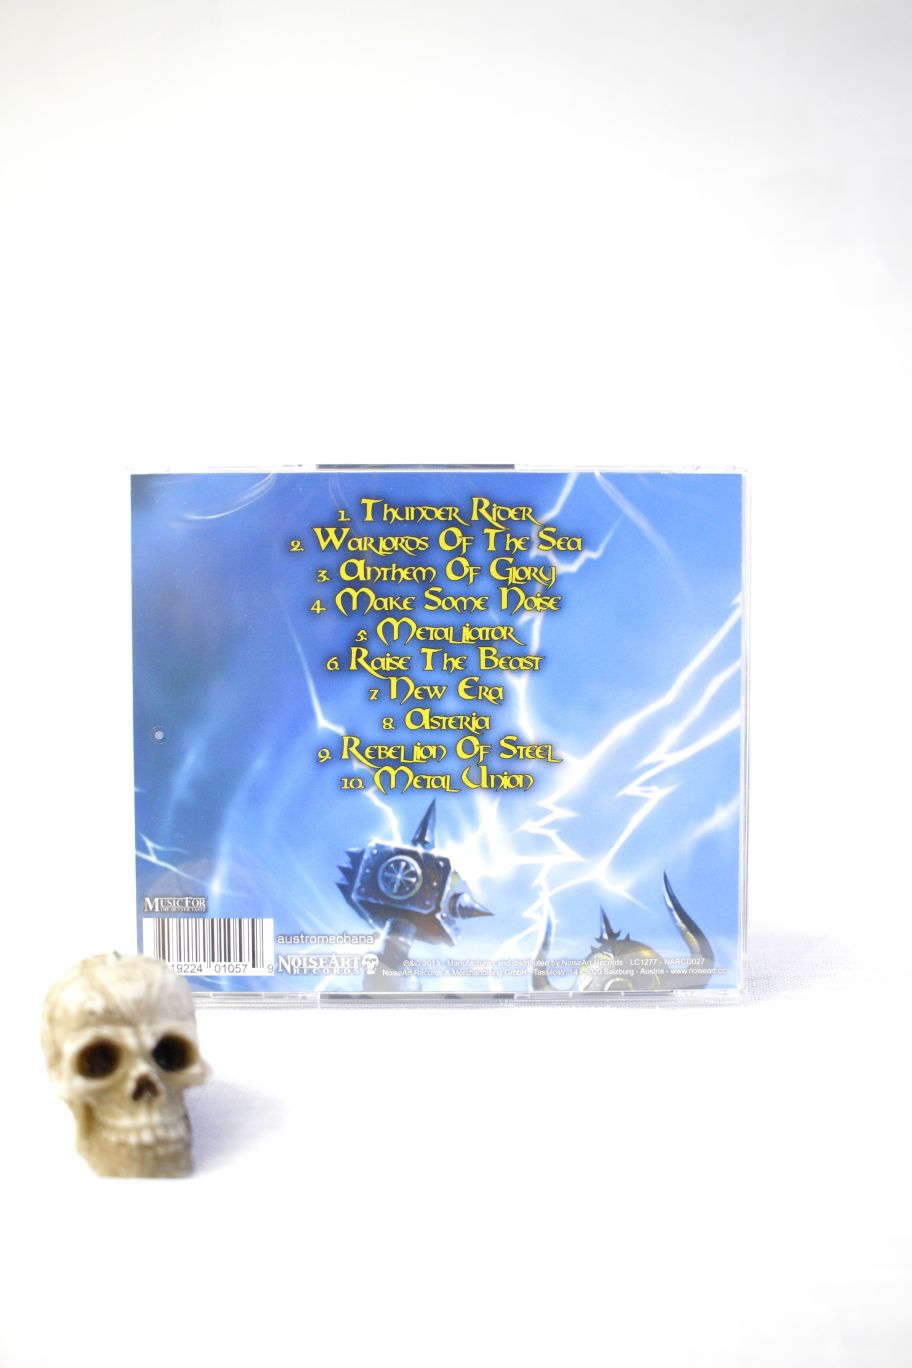 CD MAJESTY THUNDER RIDER